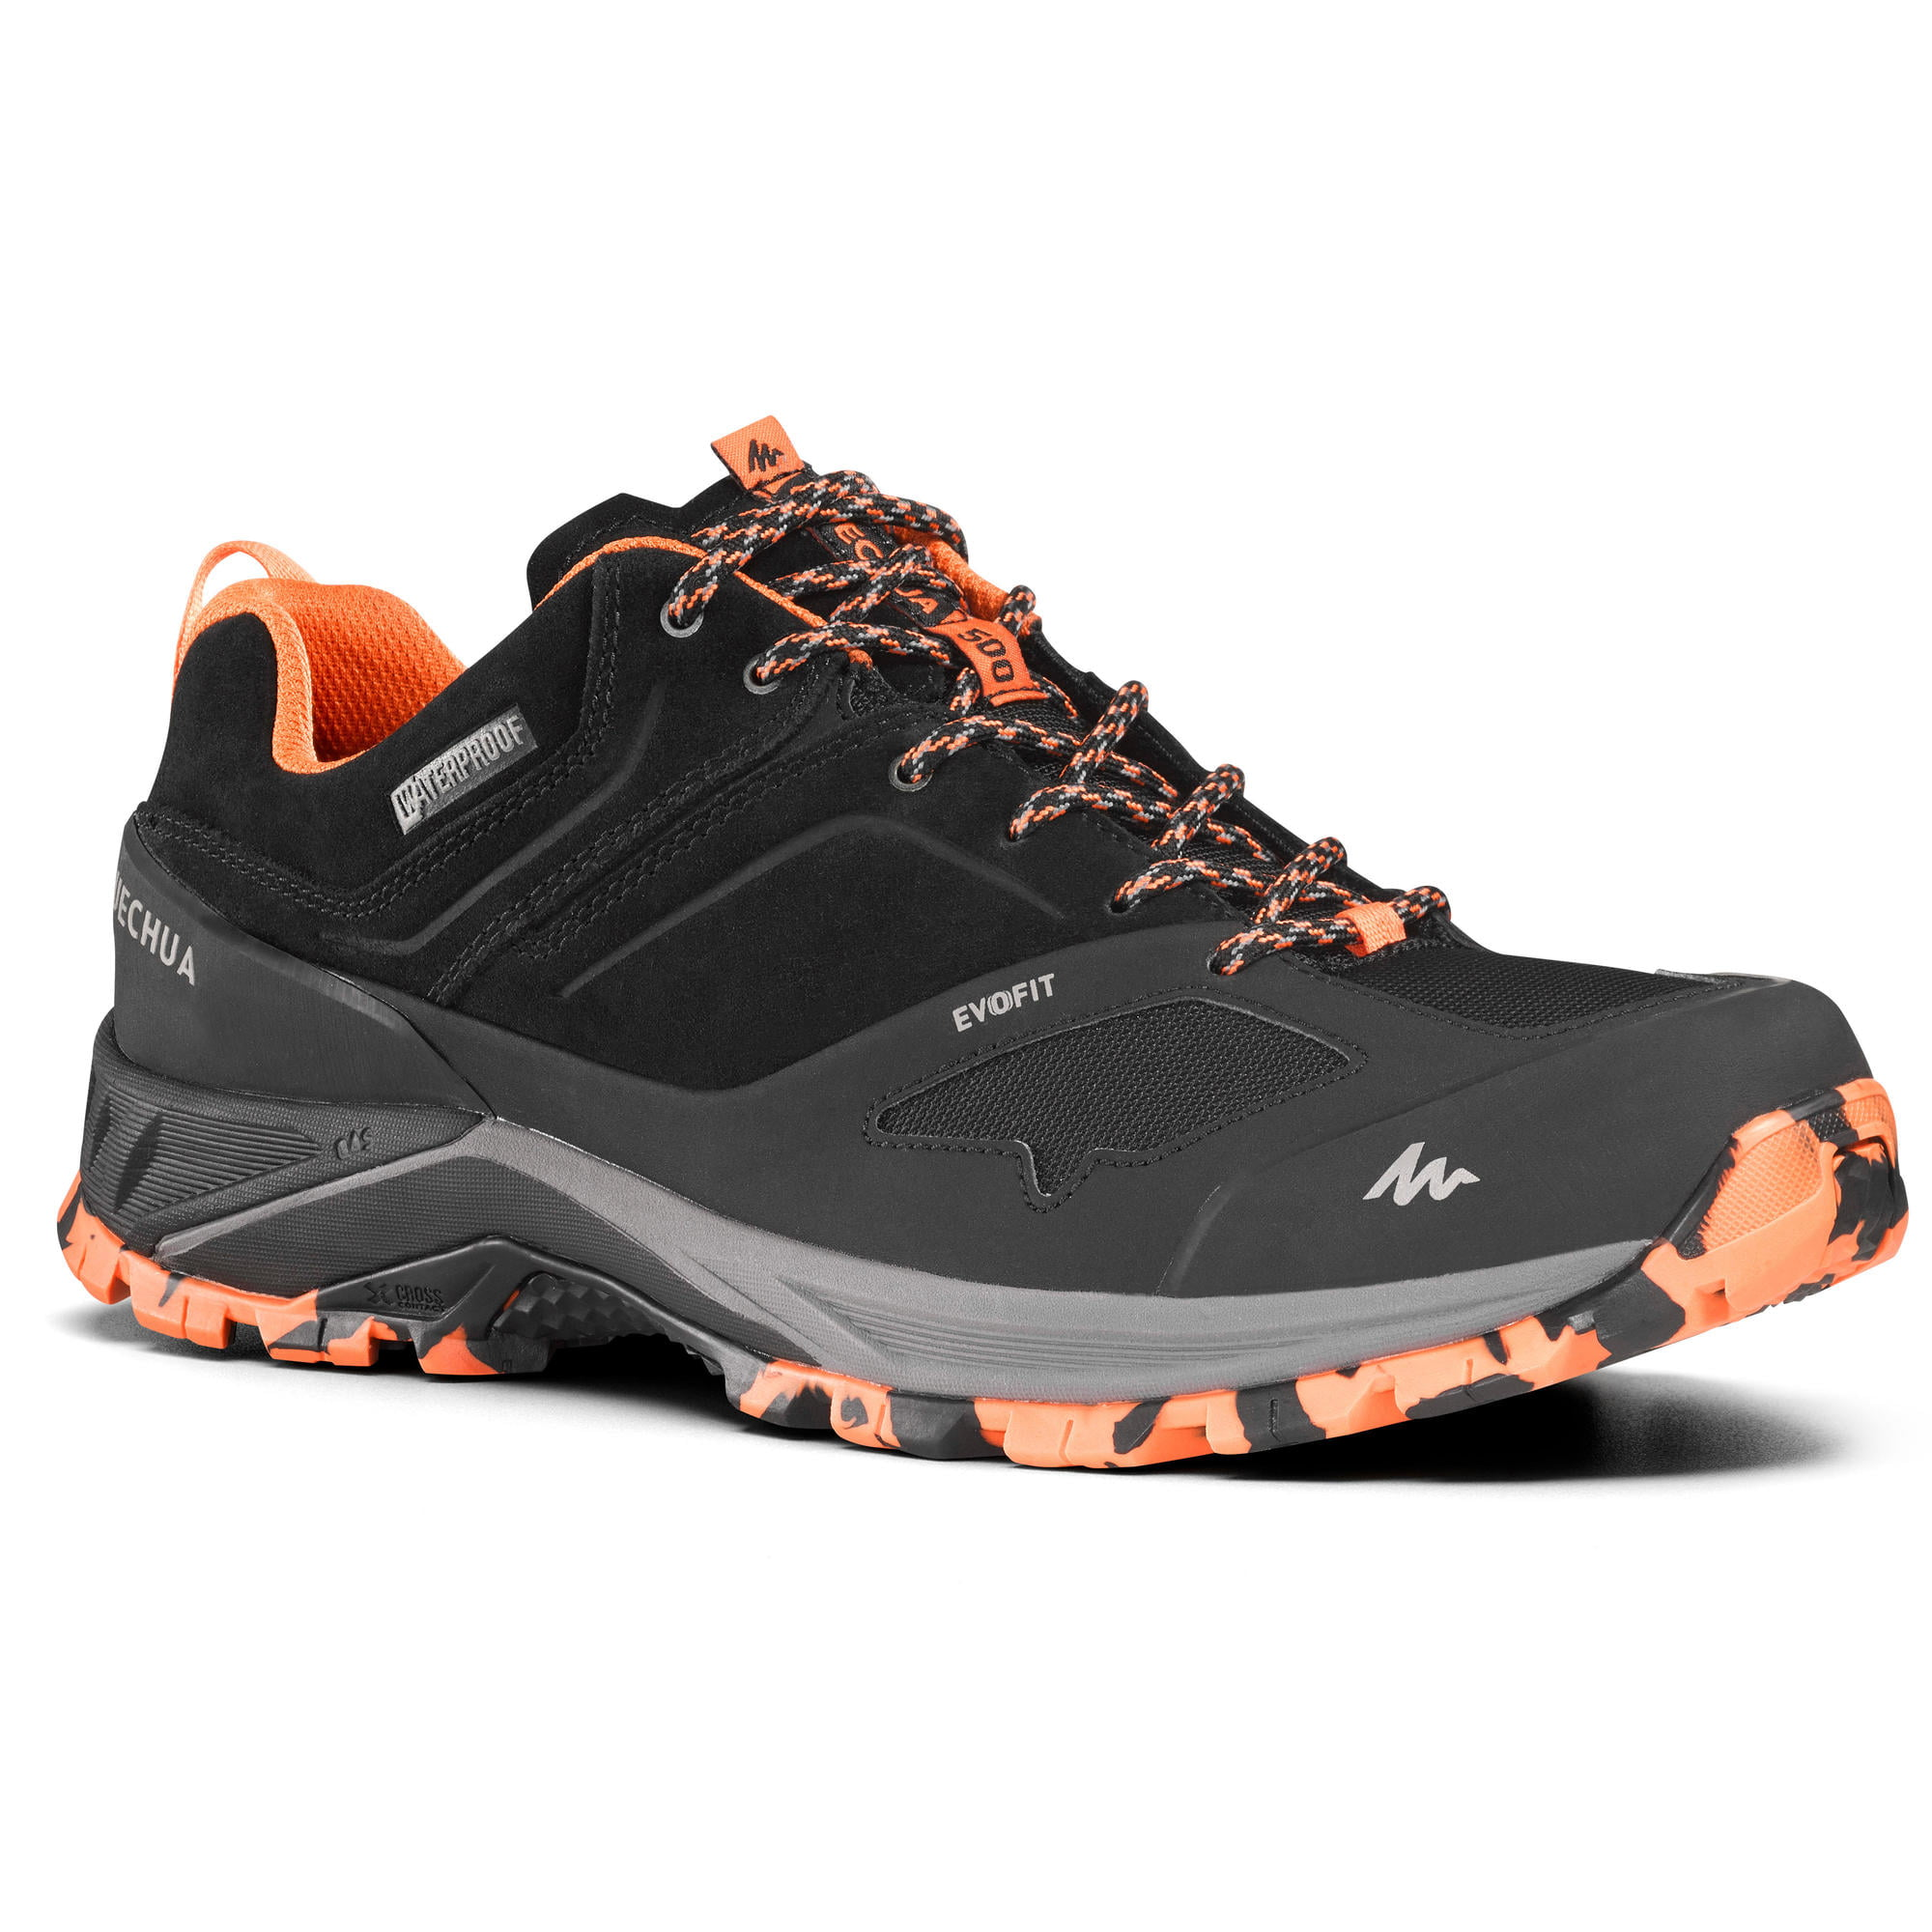 MH500 Waterproof Hiking Shoes